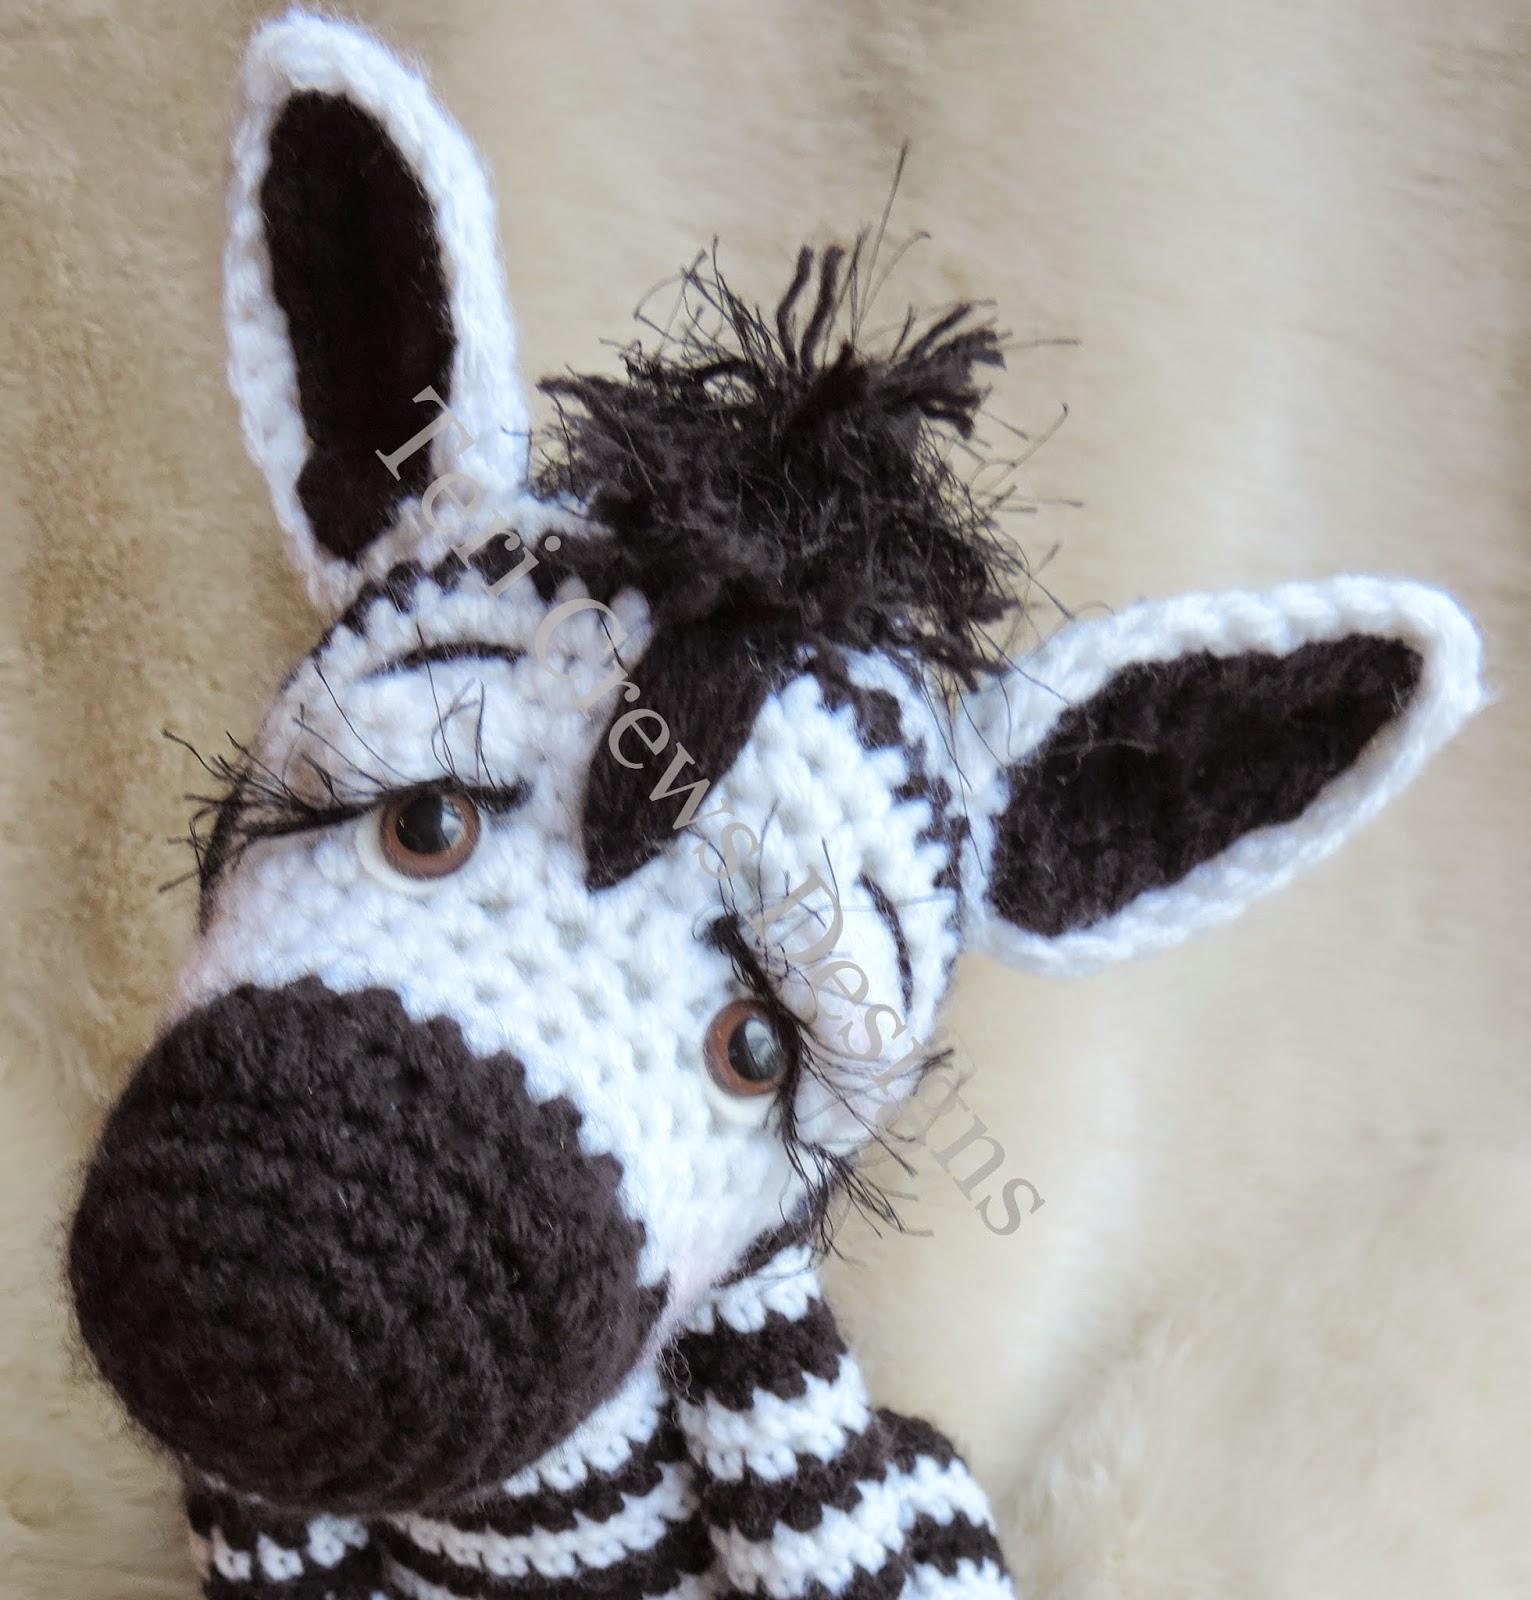 Teris Blog: Seeing Stripes, New Zebra Patterns